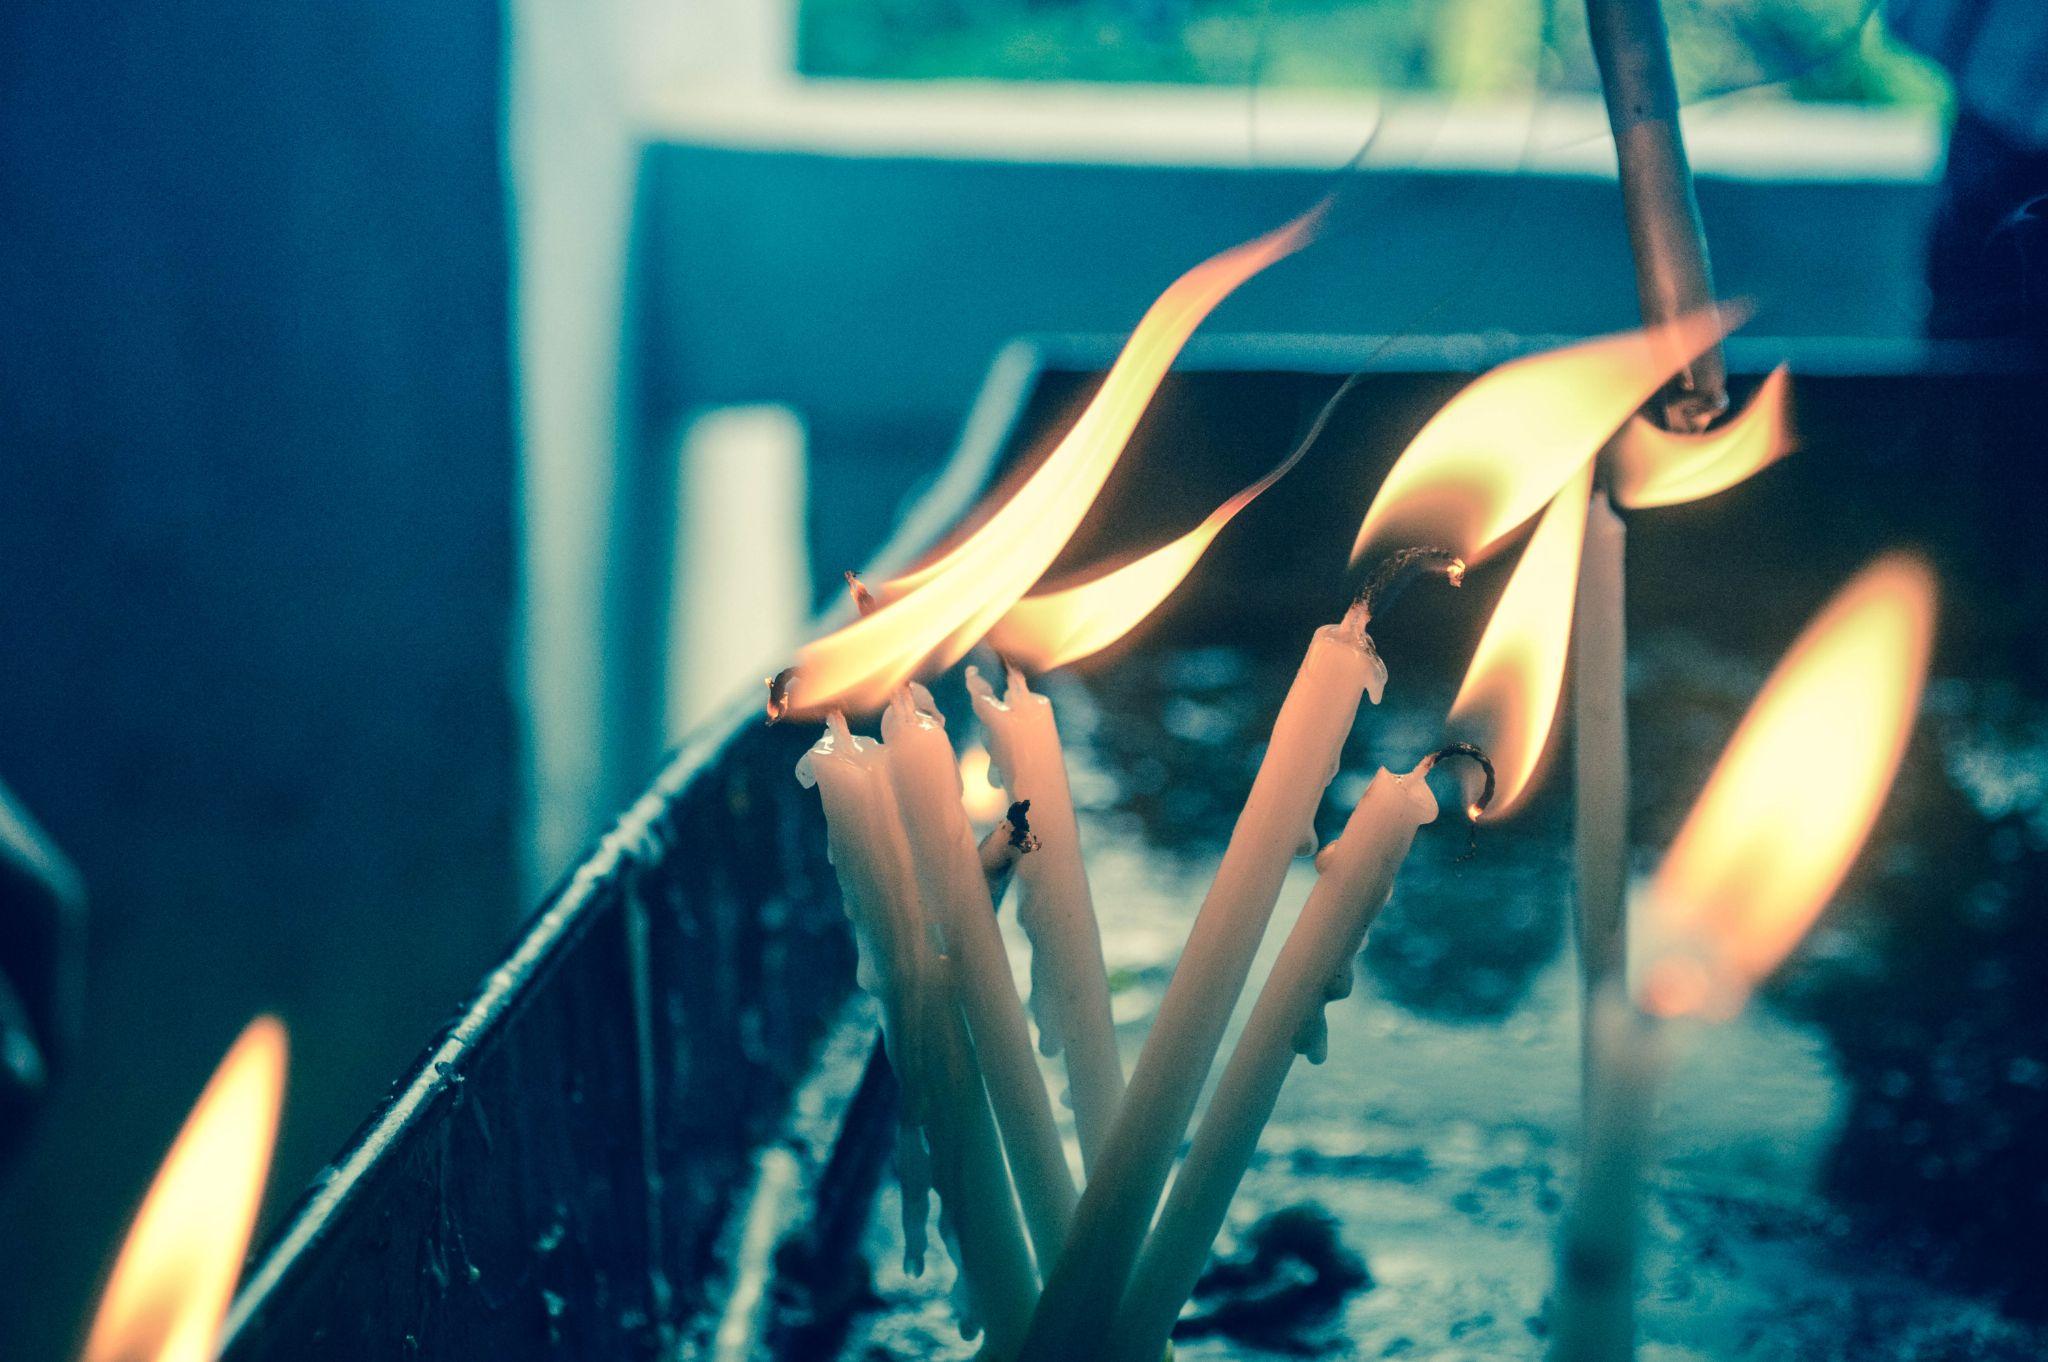 Flame by Chetan Kumar